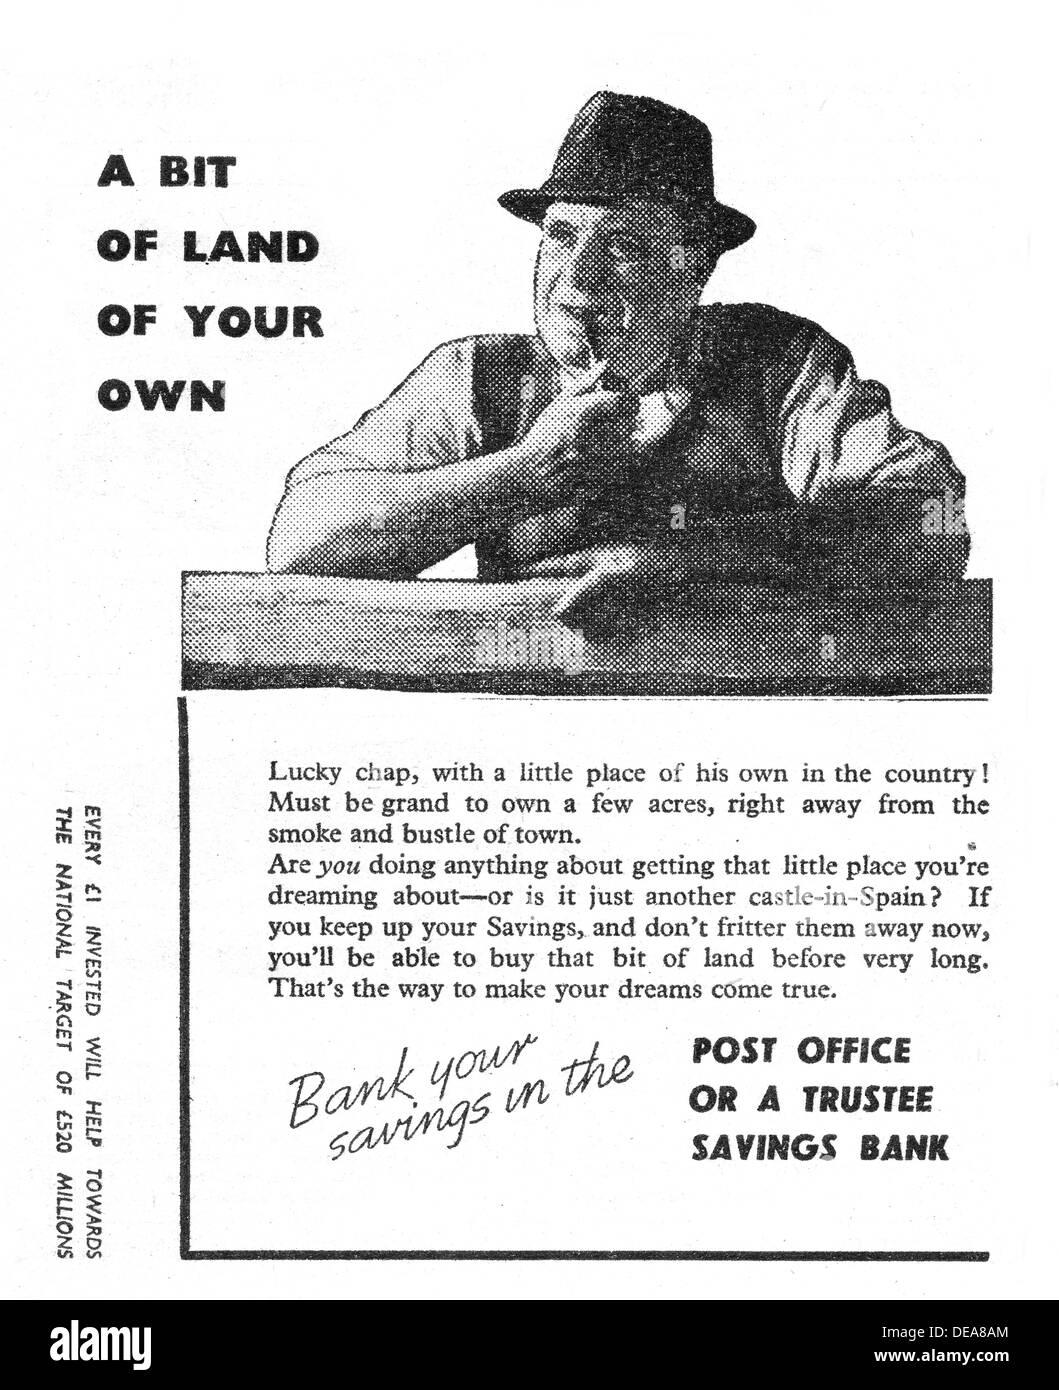 TSB Trustee Savings Bank advert in 1946 - Stock Image